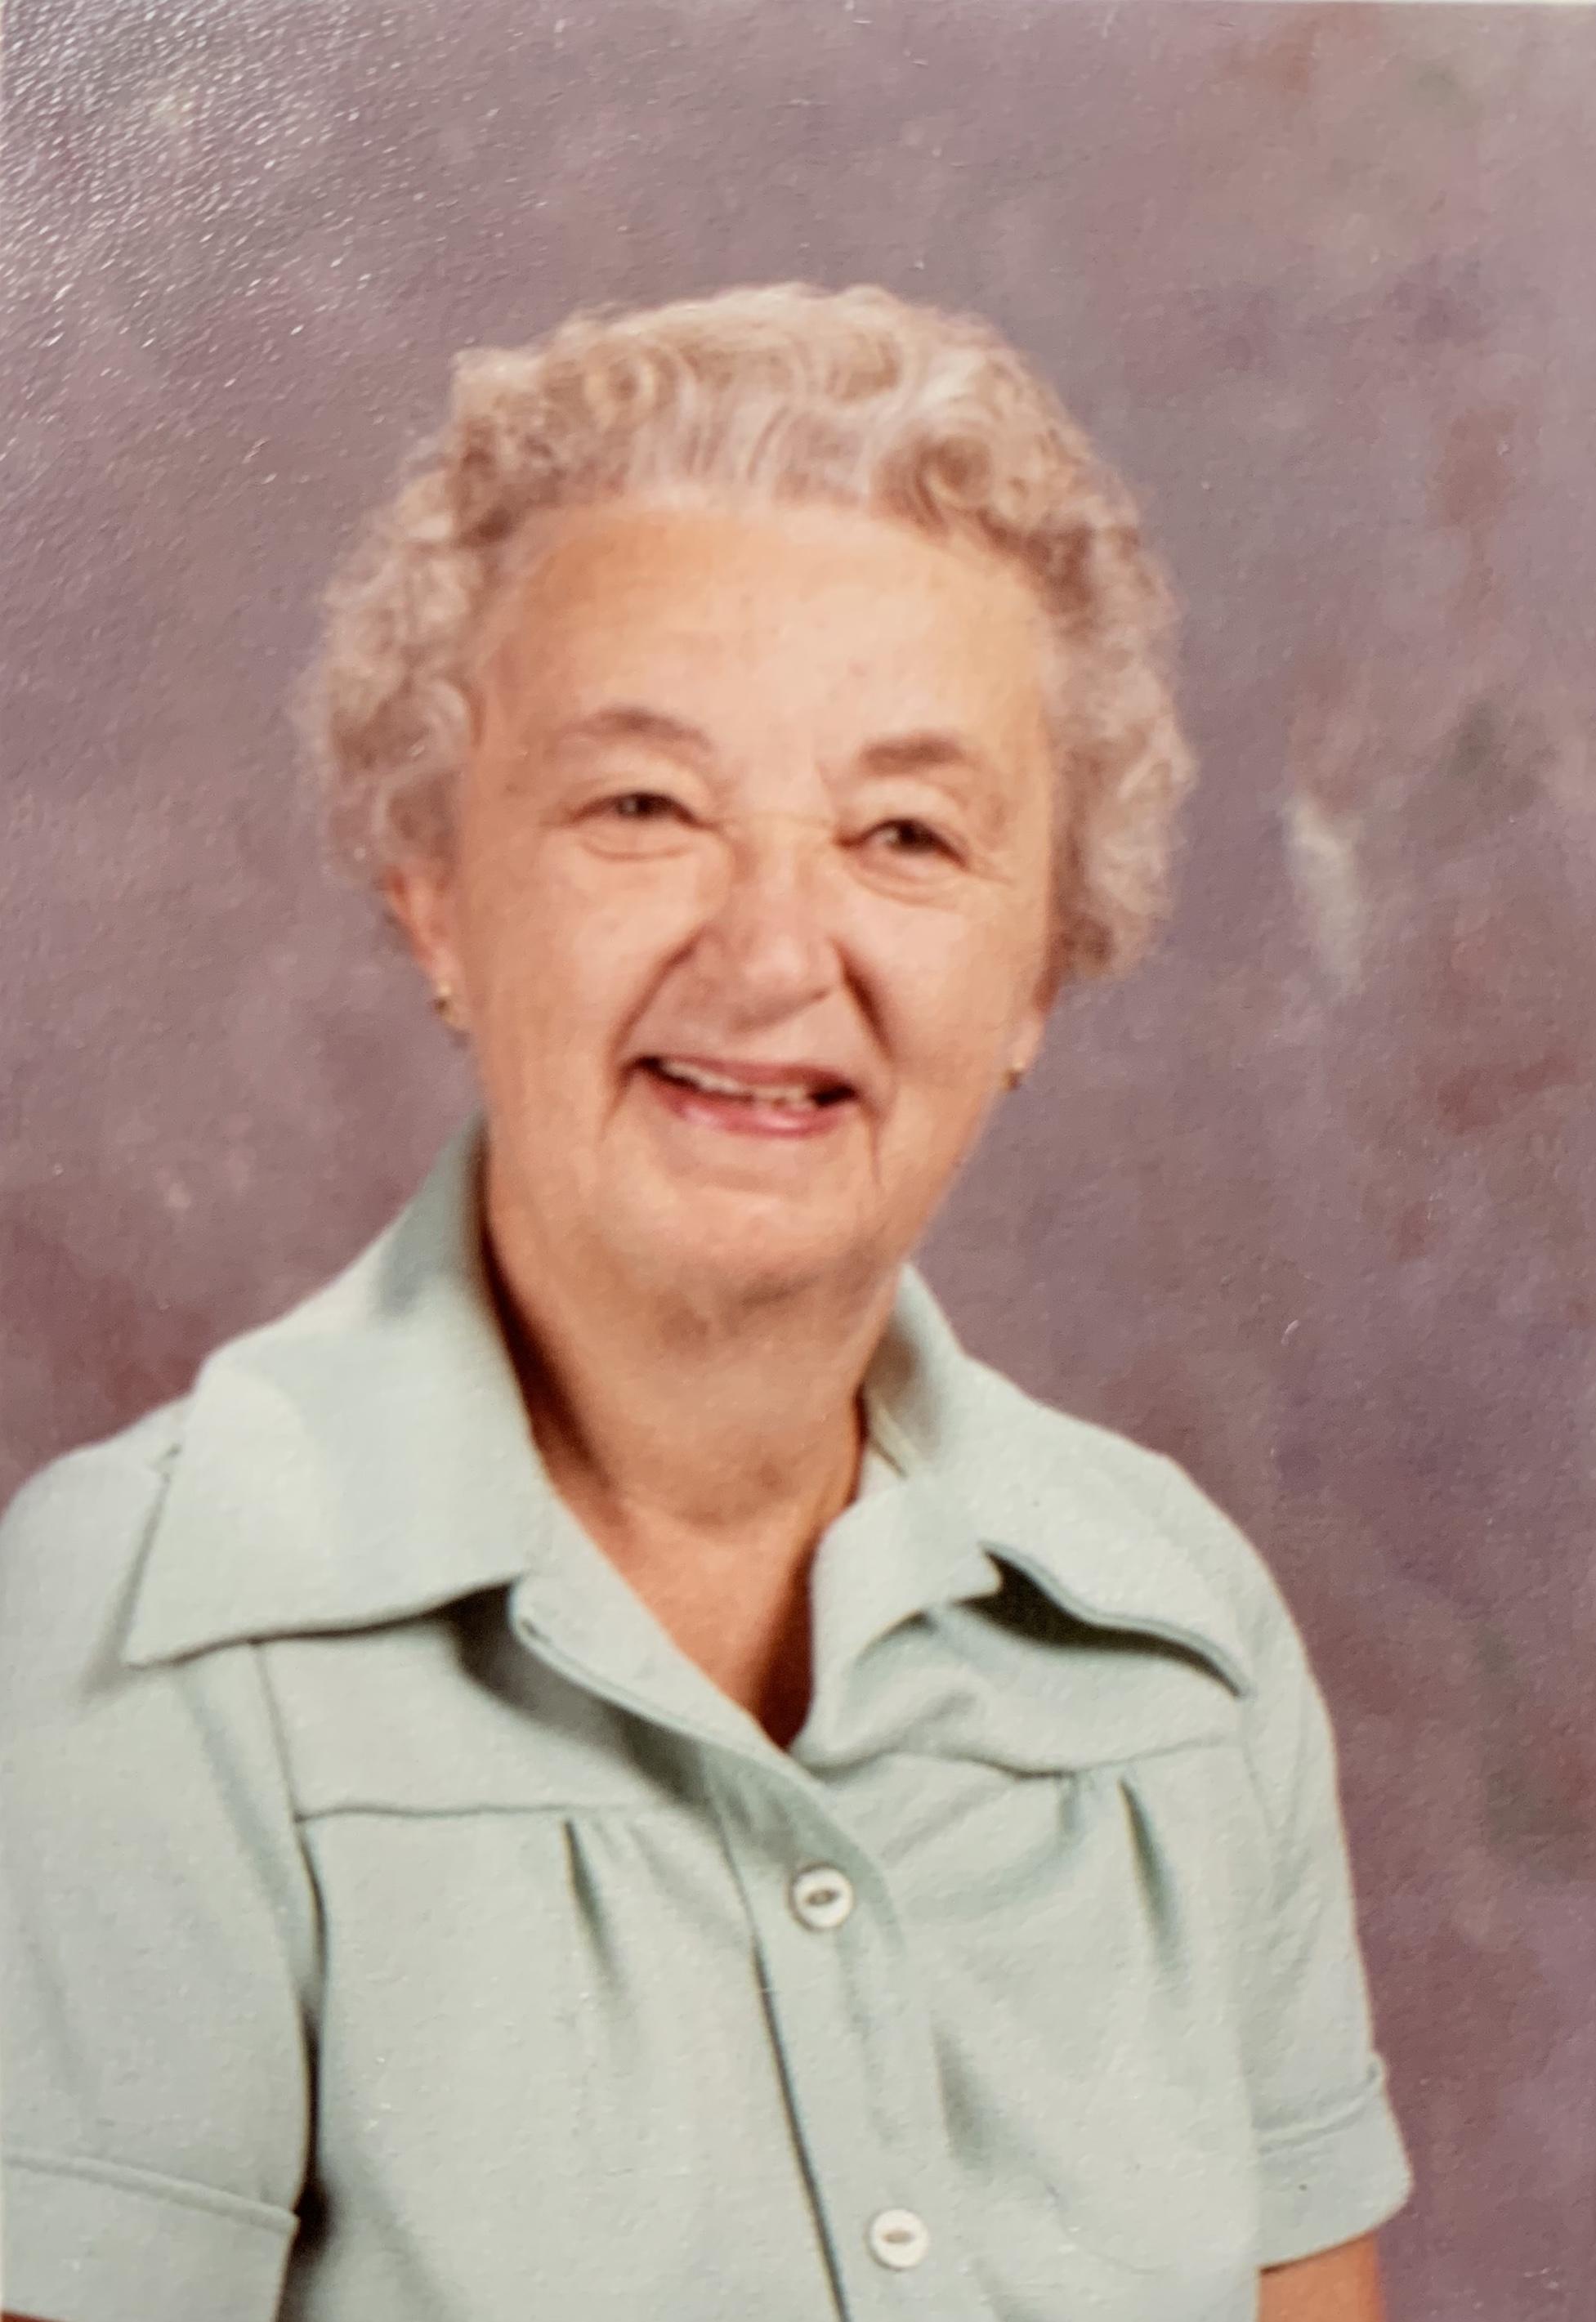 Grandma Fairy's school photo (she was a lunch lady!!)